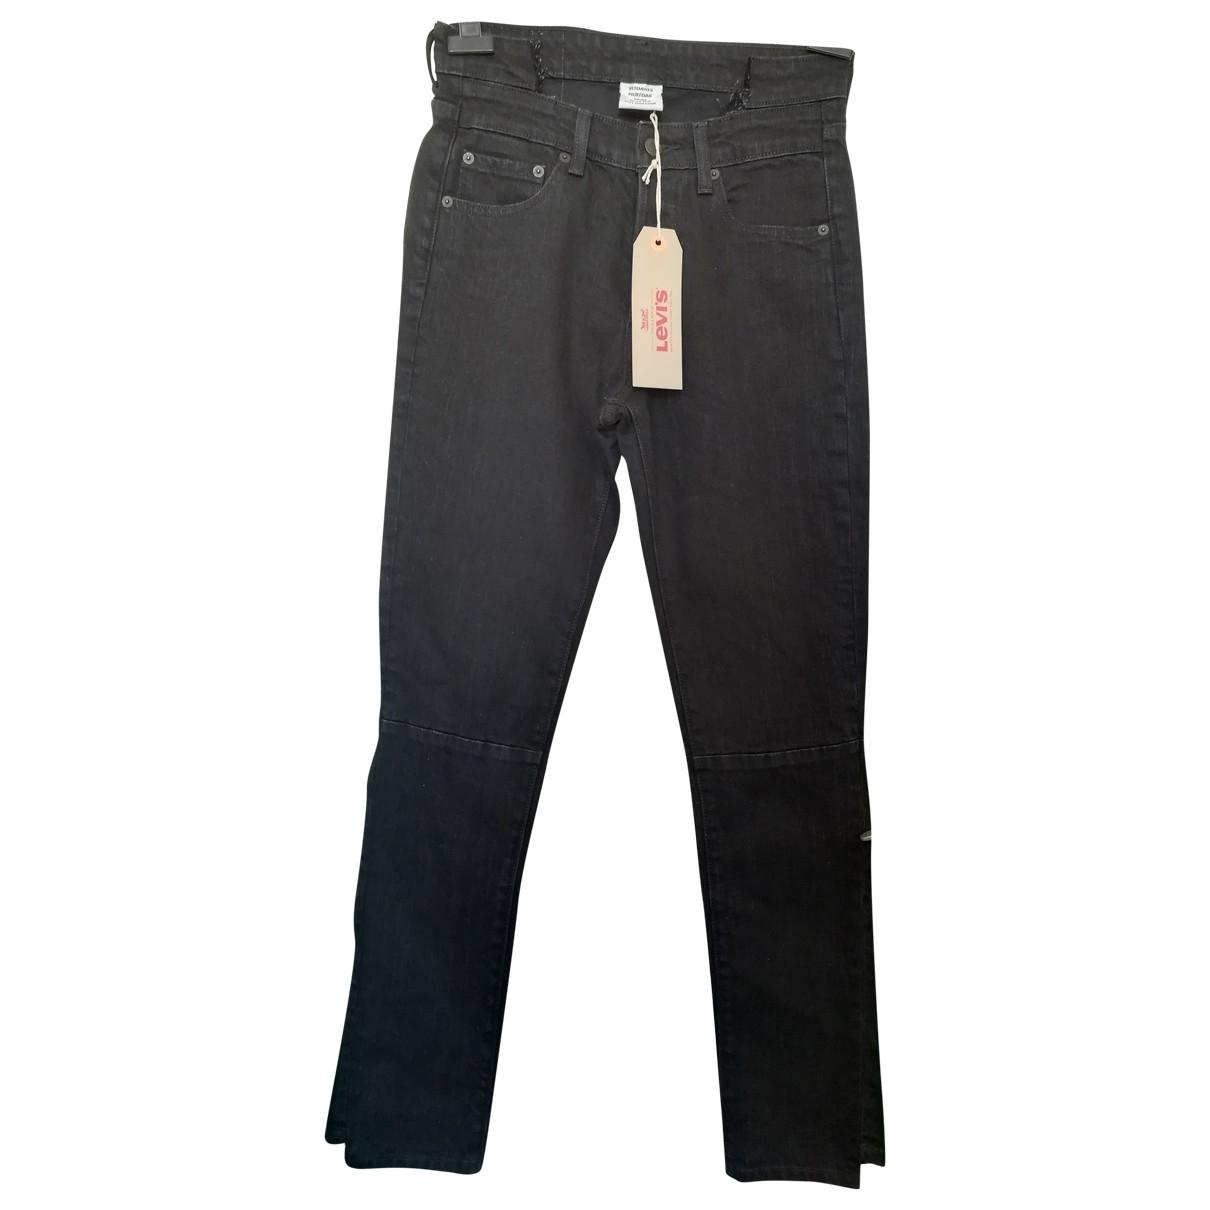 Vetements X Levi's Slim jeans